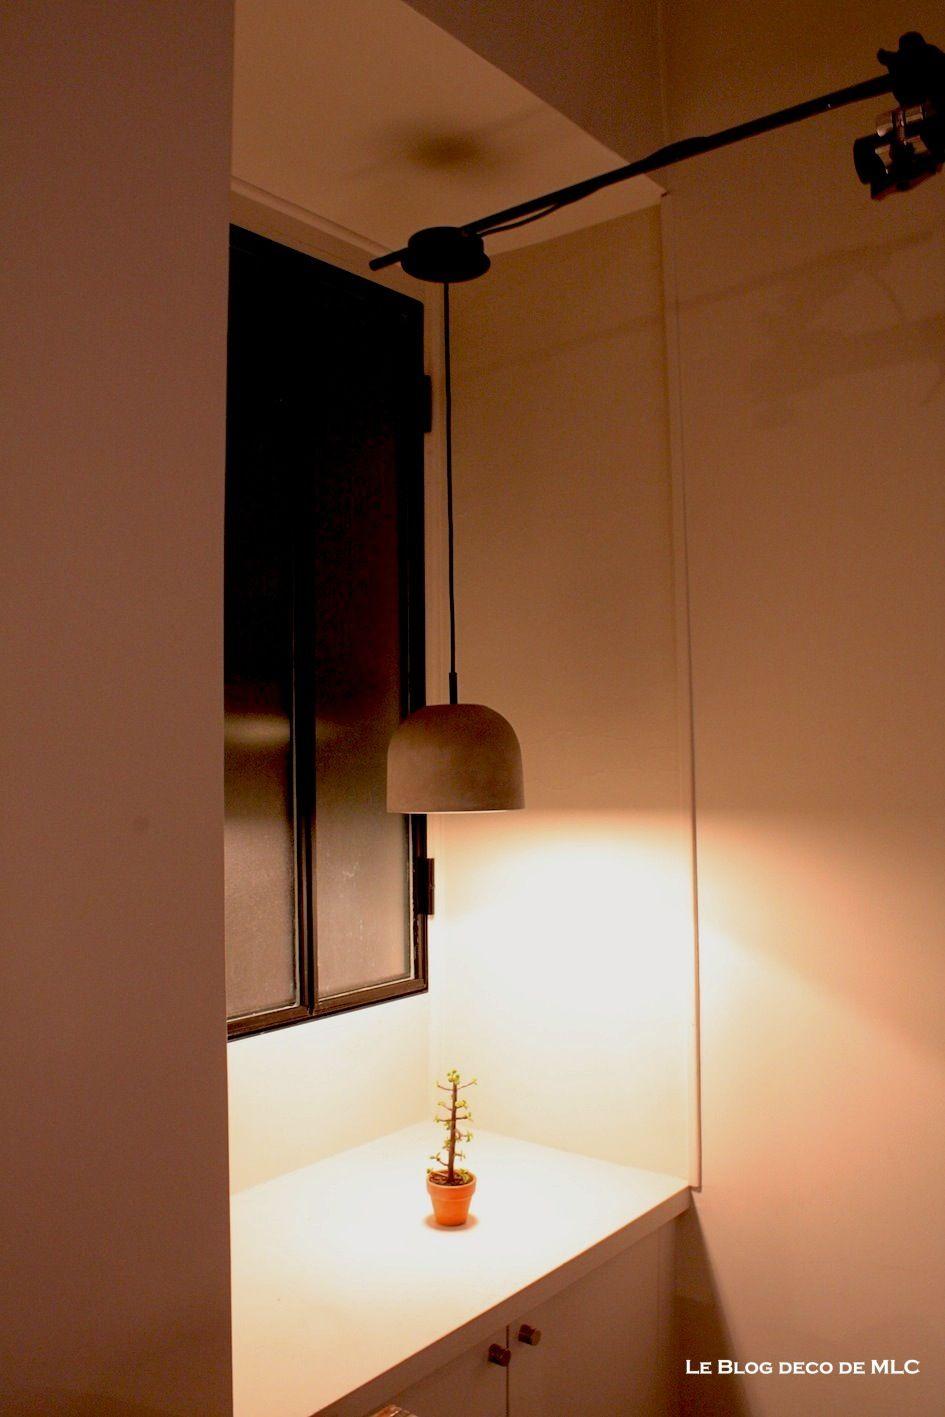 Lumière Bo Design Mlc Aime ConceptLuminaires Et De LampeChaise zVpjqMGLSU